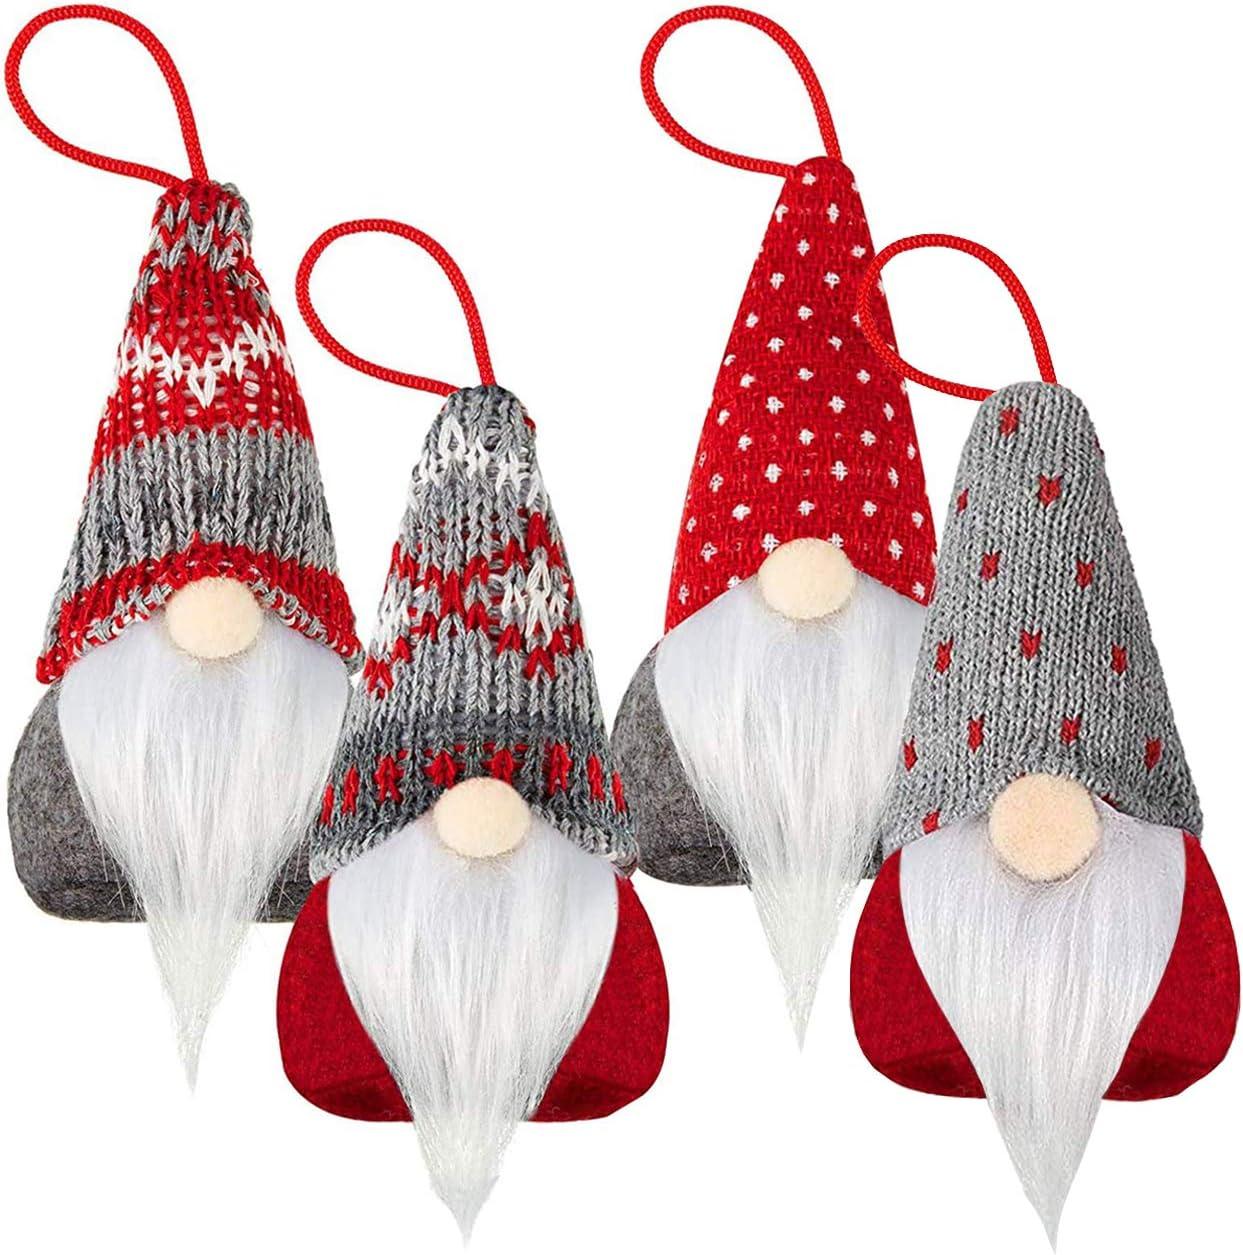 UMEELR Gnome Christmas Decorations, Handmade Swedish Tomte Xmas Gnome Faceless Plush Doll Pendant, Scandinavian Santa Elf Hanging Ornaments for Christmas Tree Holiday Fireplace Home Decor 4 Pack